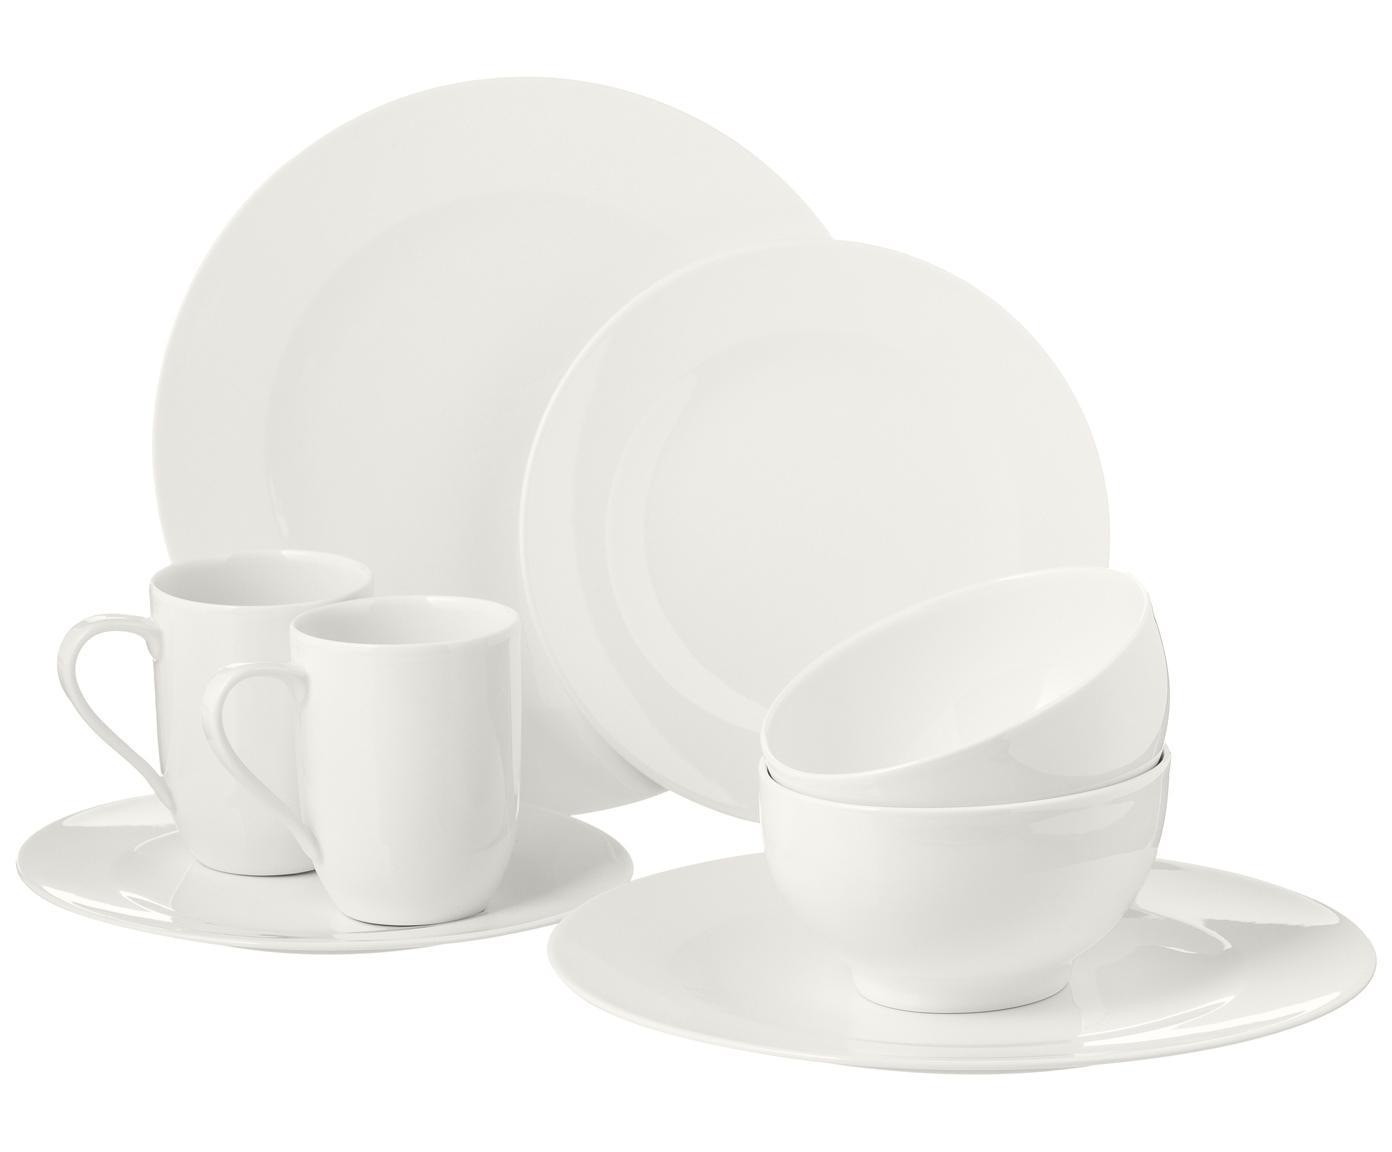 Vajilla de porcelana For Me, 4comensales(16pzas.), Porcelana, Blanco crudo azulado, Tamaños diferentes